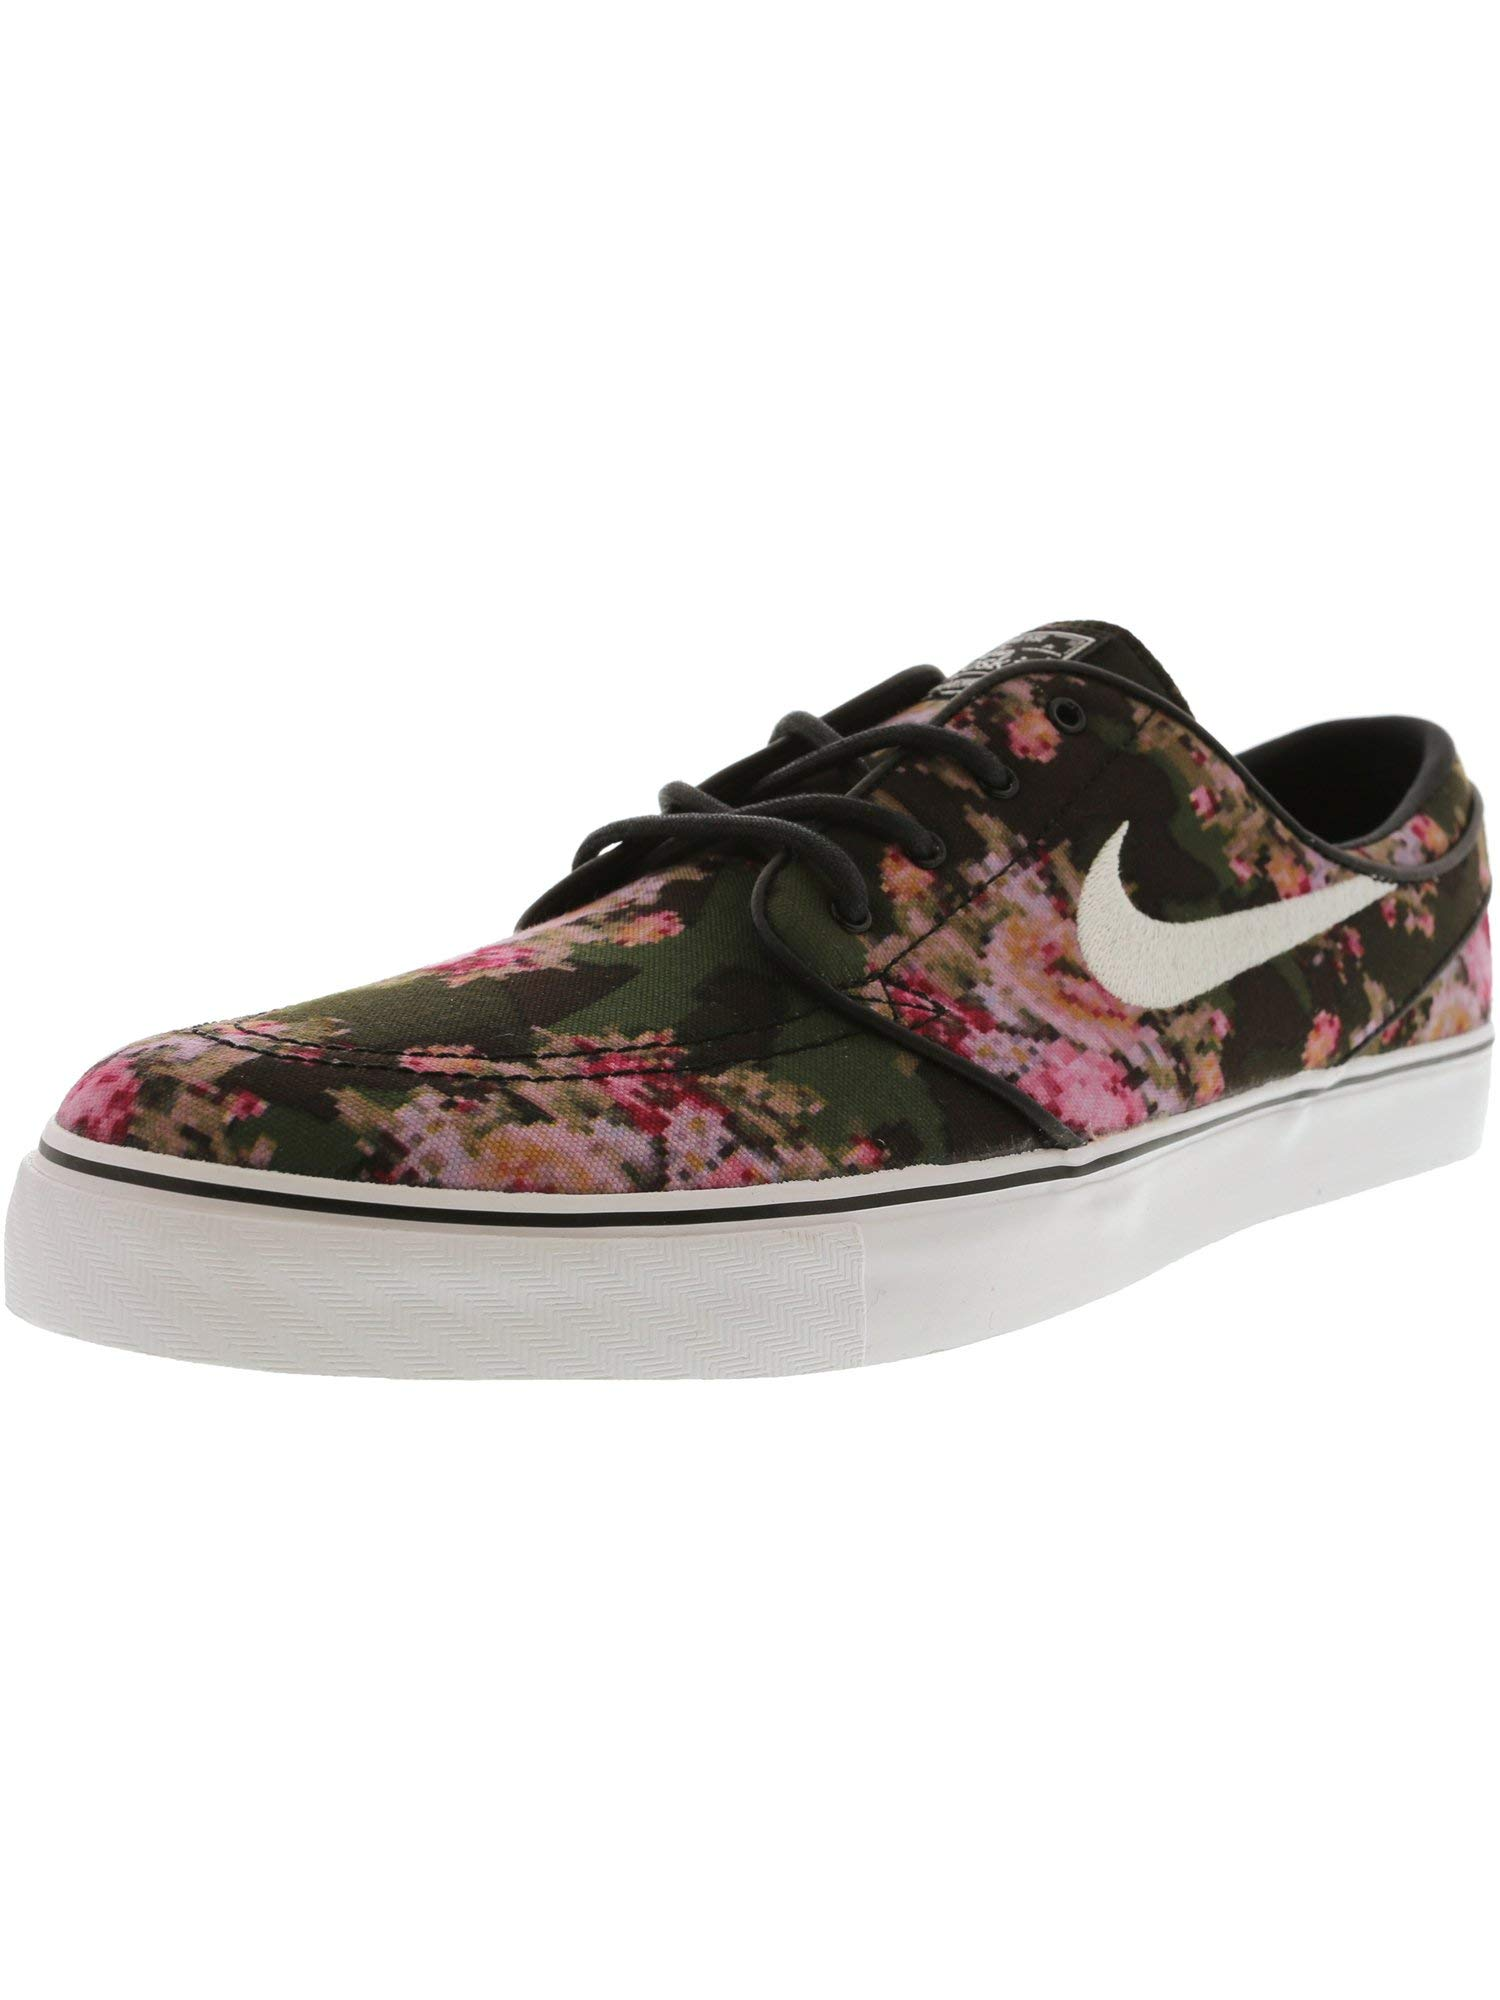 100% authentic 9e6ad 899f0 Galleon - Nike SB Zoom Stefan Janoski Premium (Multi-Color Black) Mens Skateboarding  Shoes